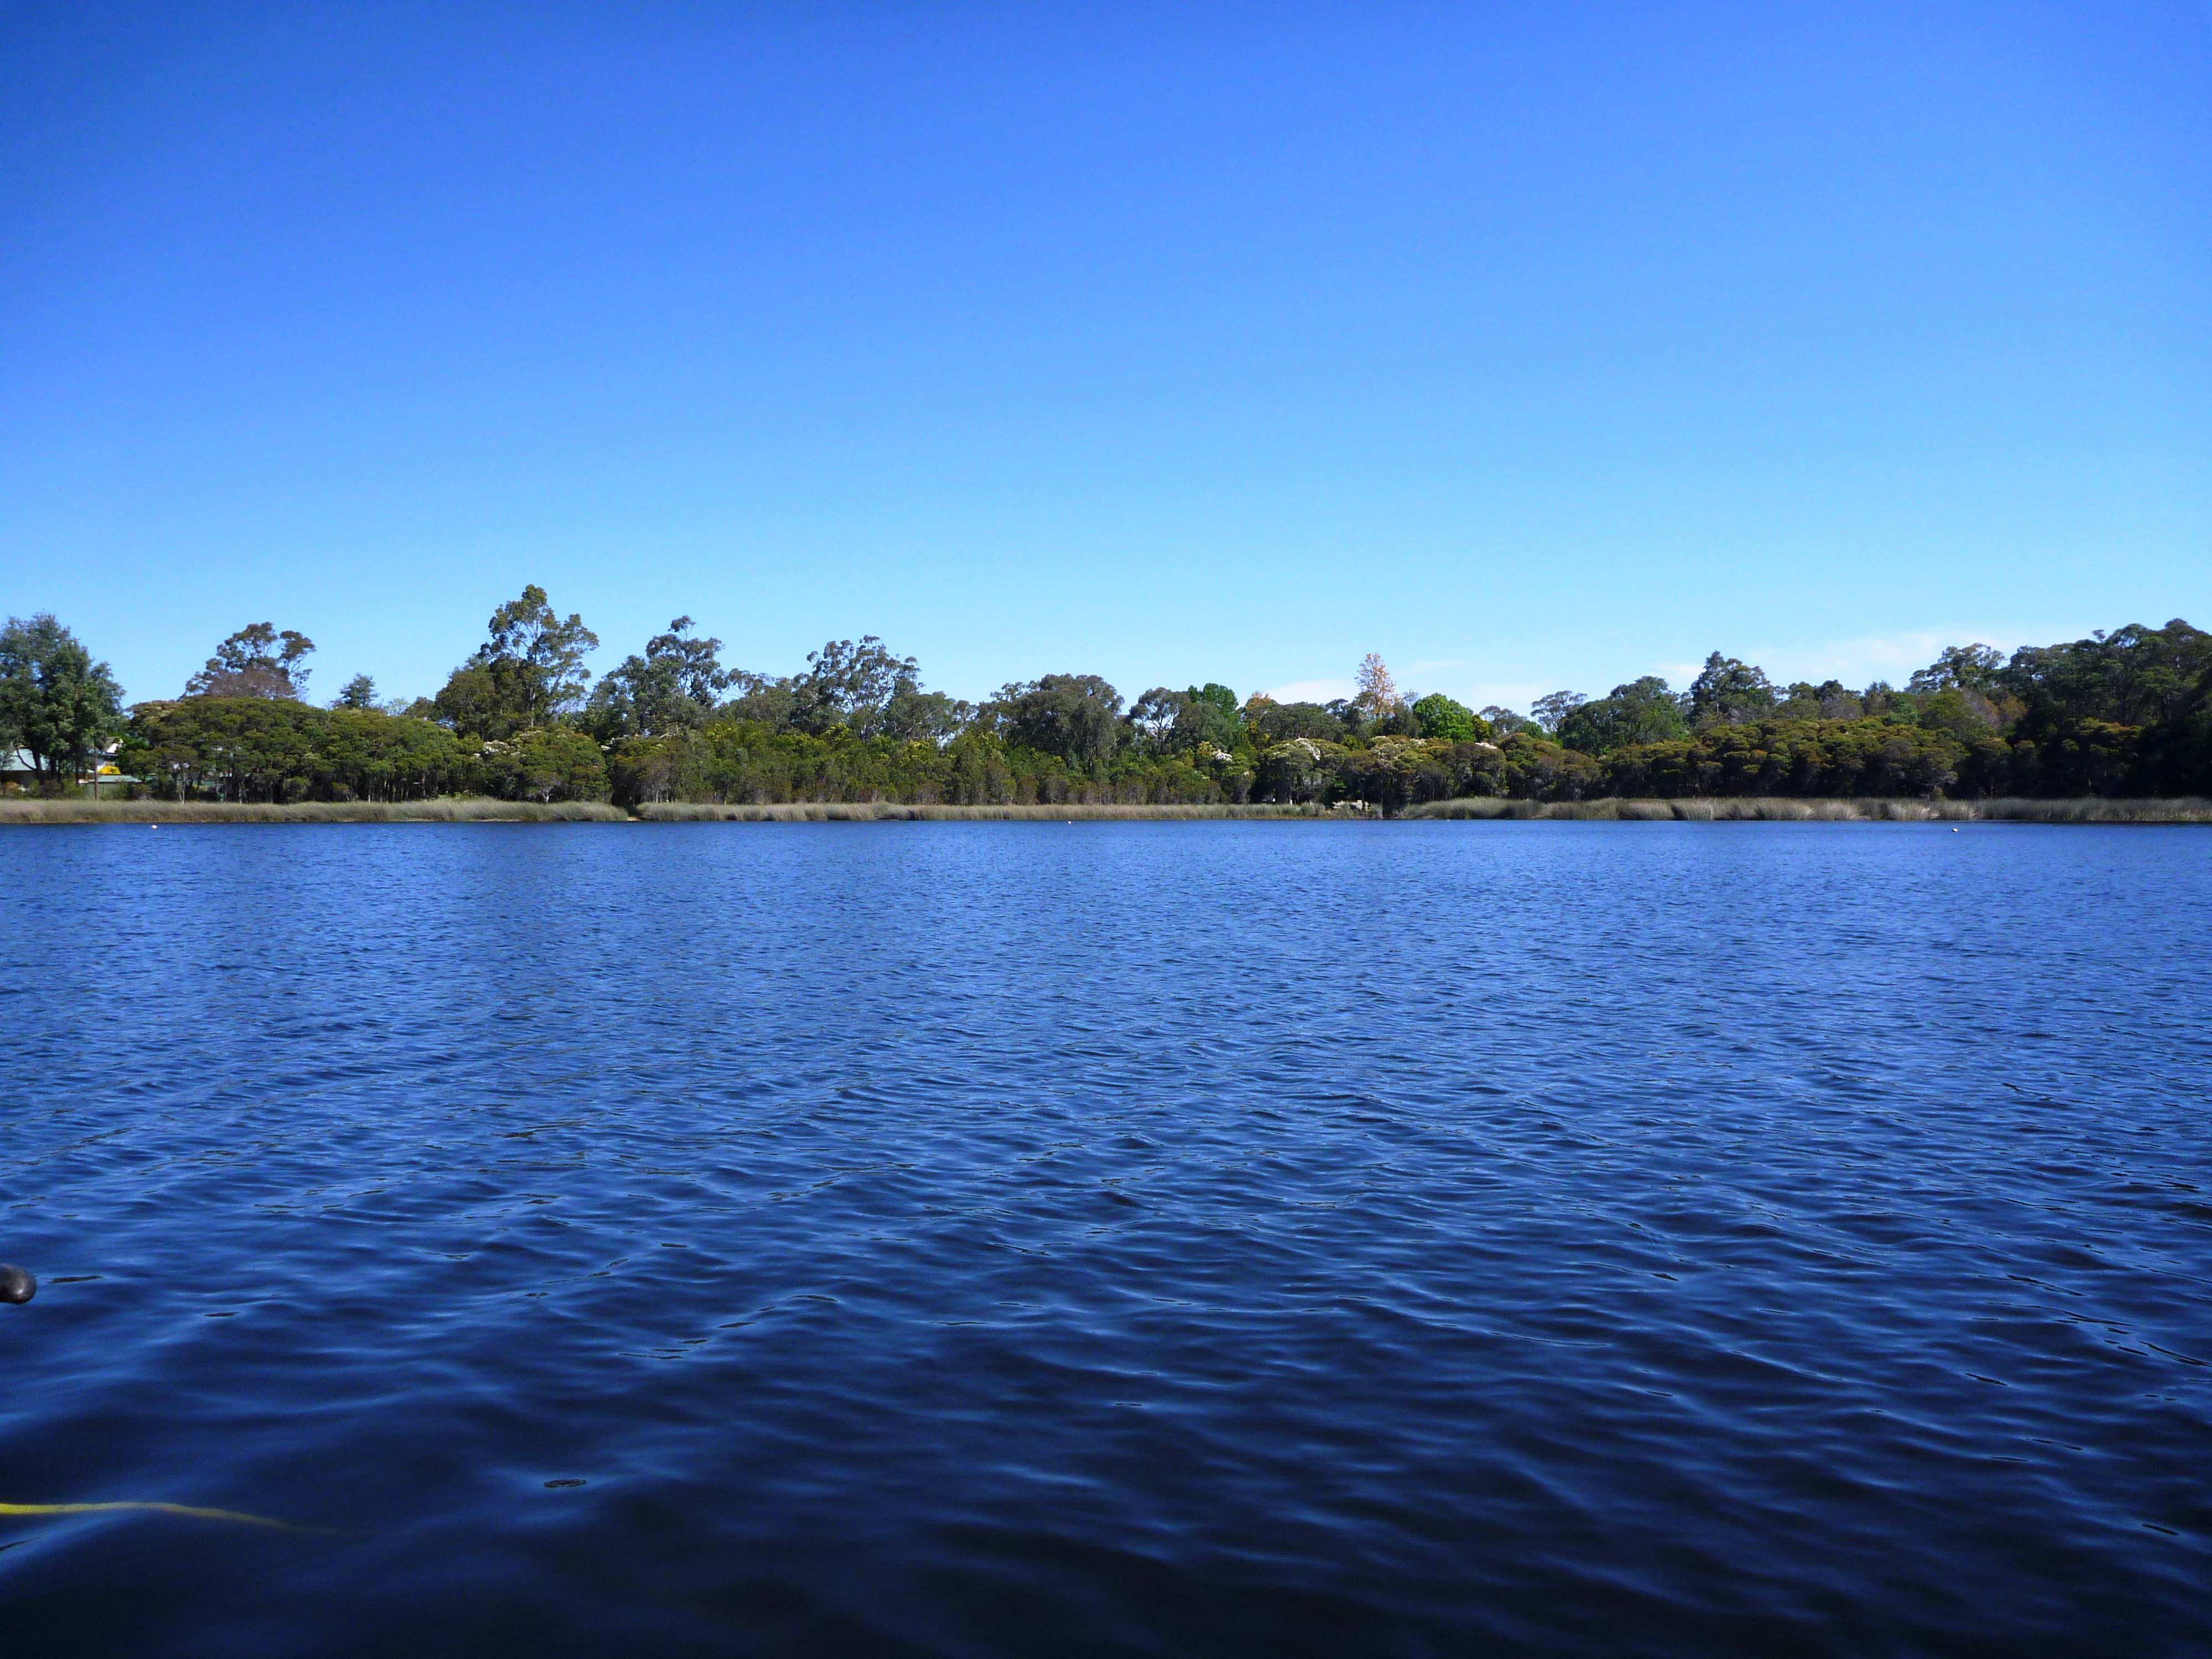 AFTER_Glenbrook_Lagoon